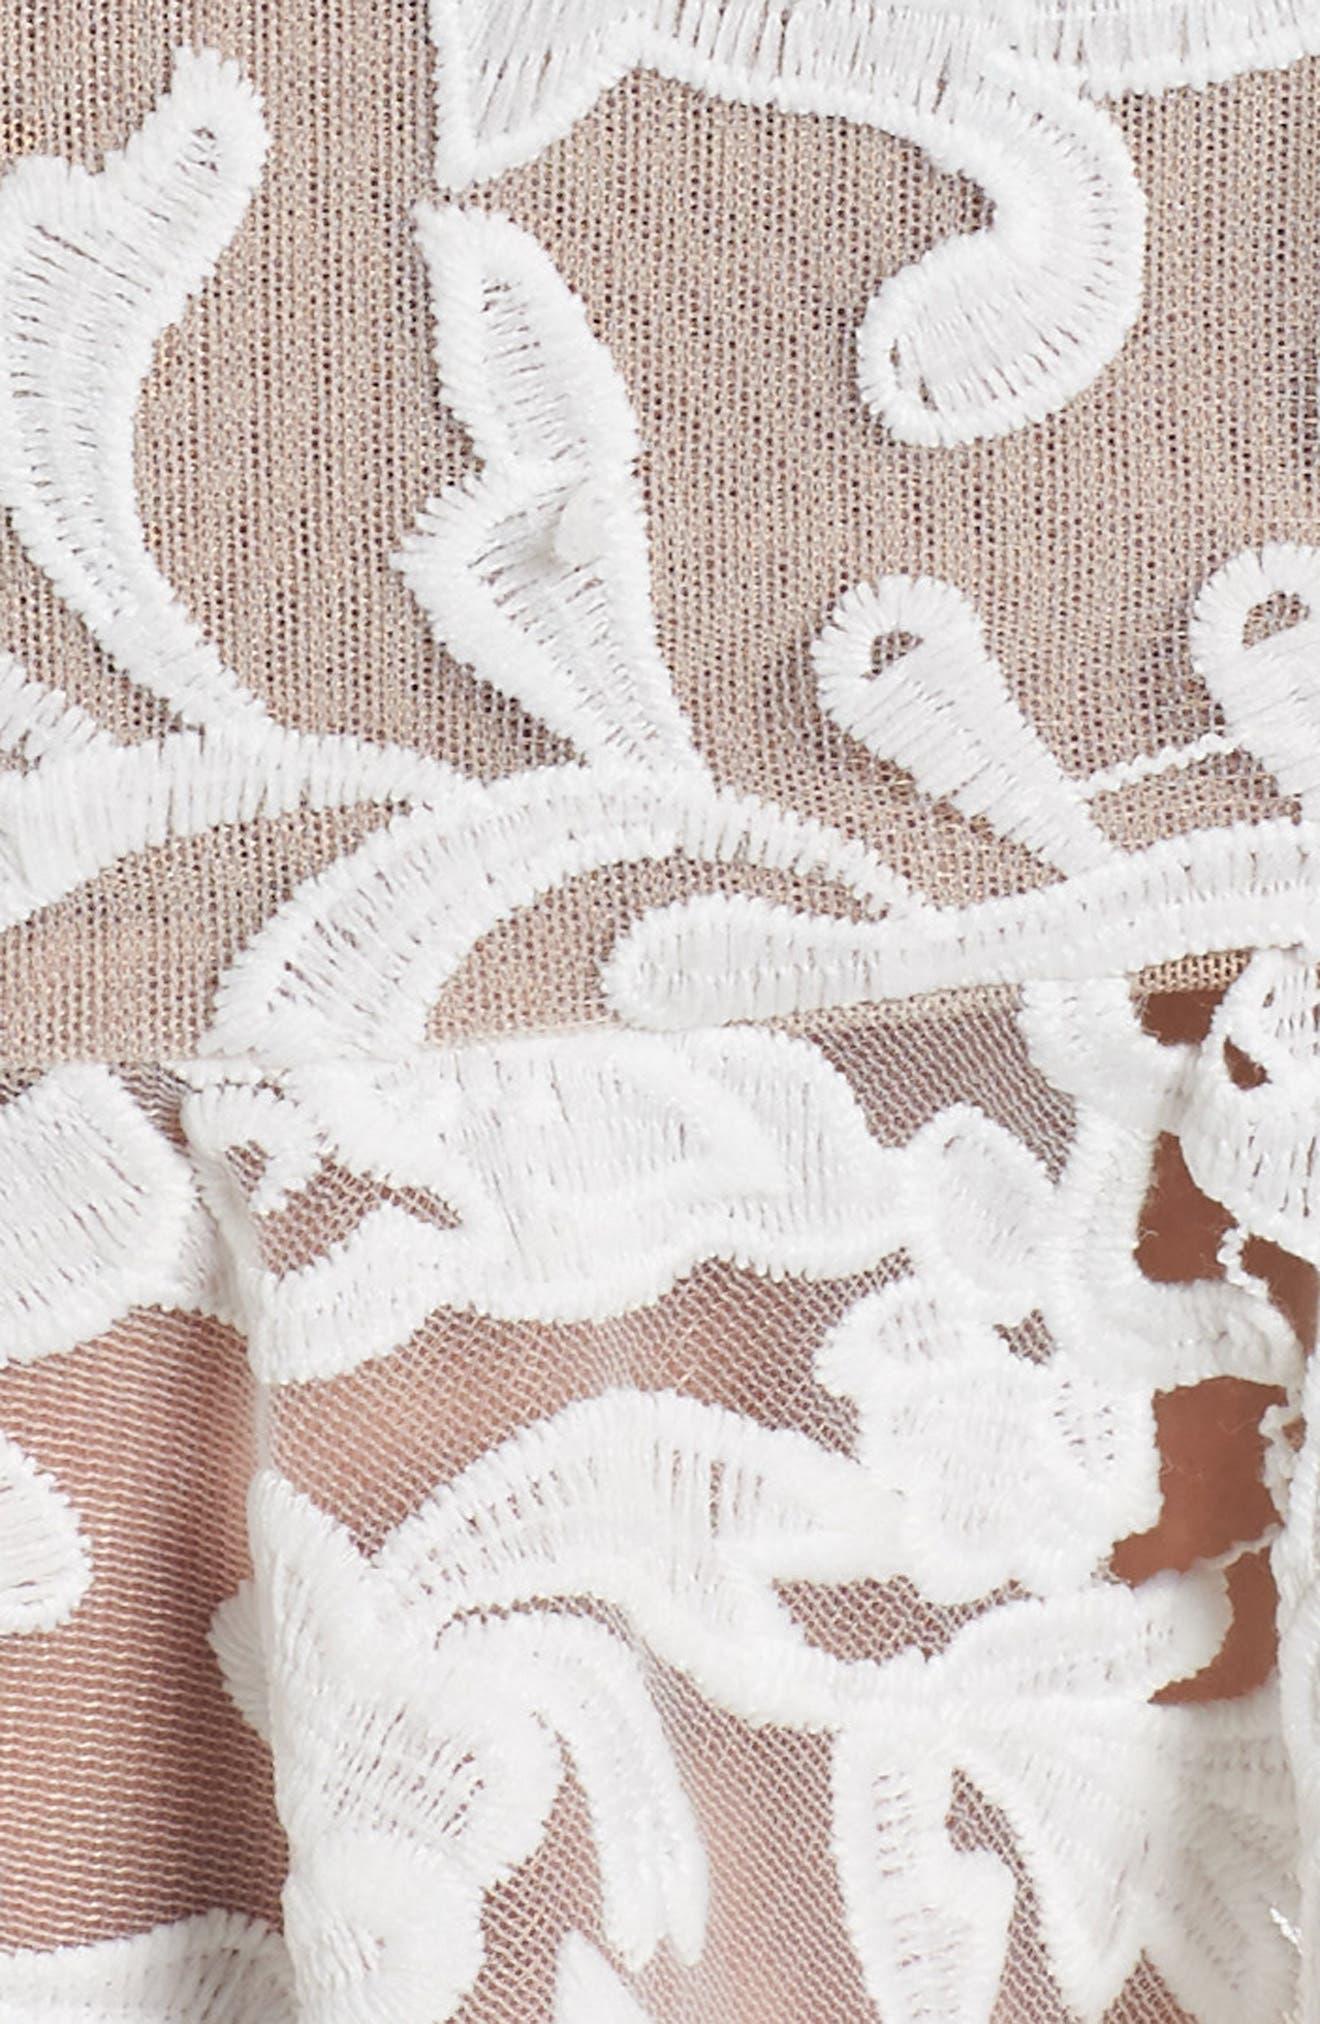 Rocha Waterfall Ruffle Lace Midi Dress,                             Alternate thumbnail 5, color,                             White